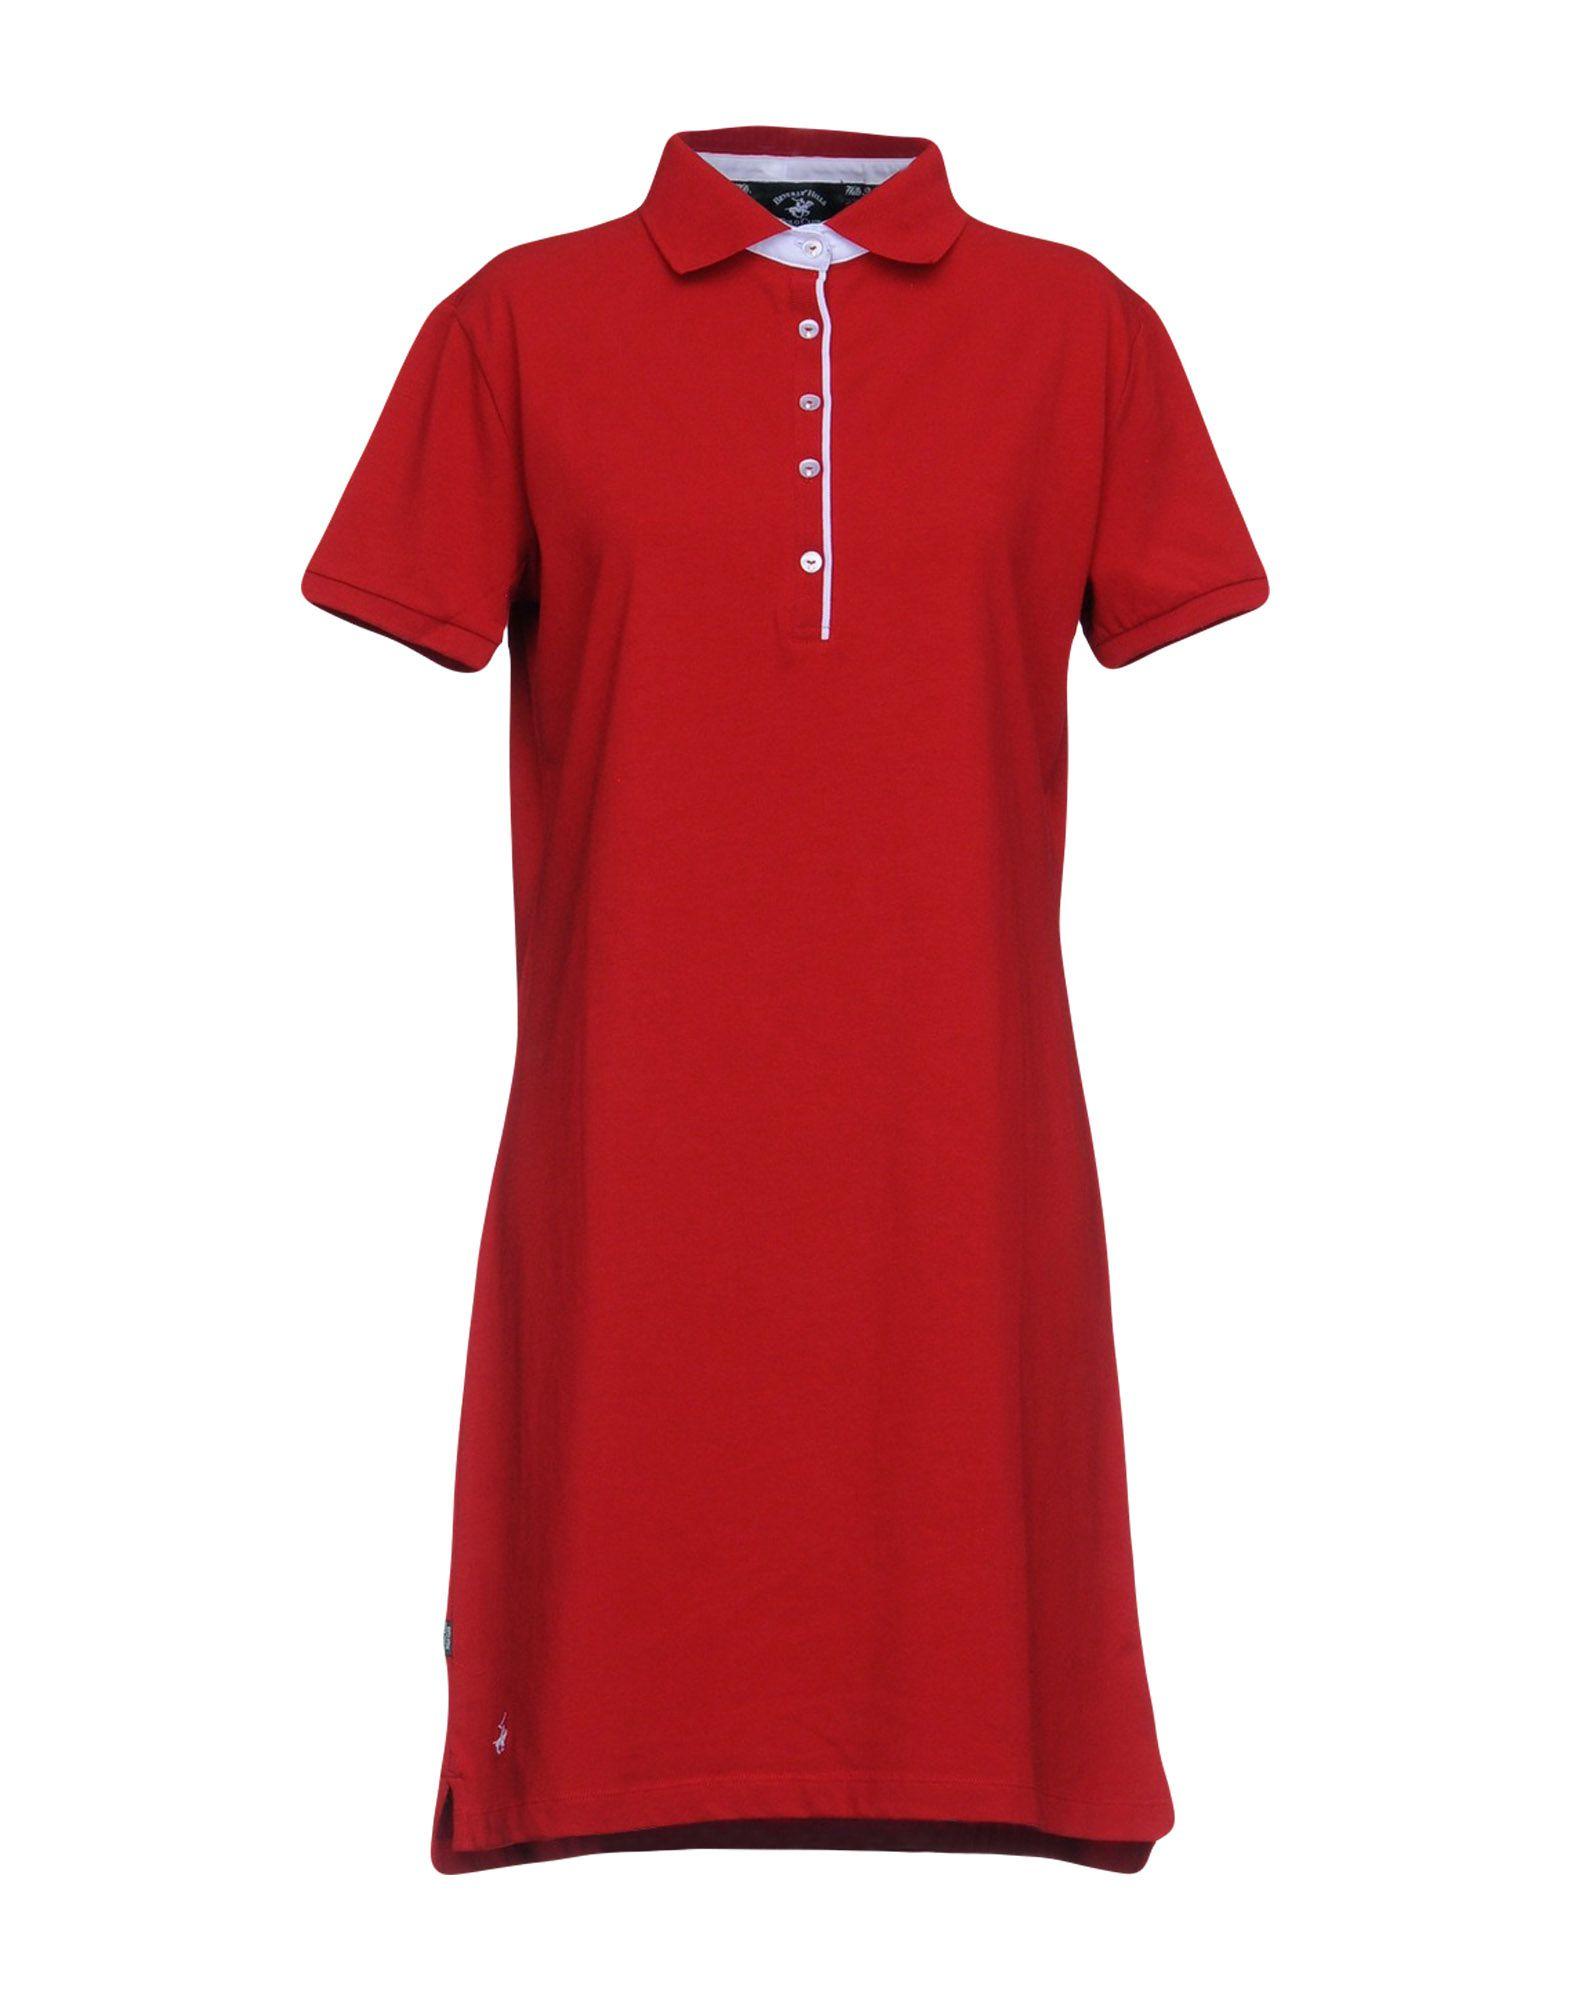 BEVERLY HILLS POLO CLUB Damen Kurzes Kleid Farbe Rot Größe 5